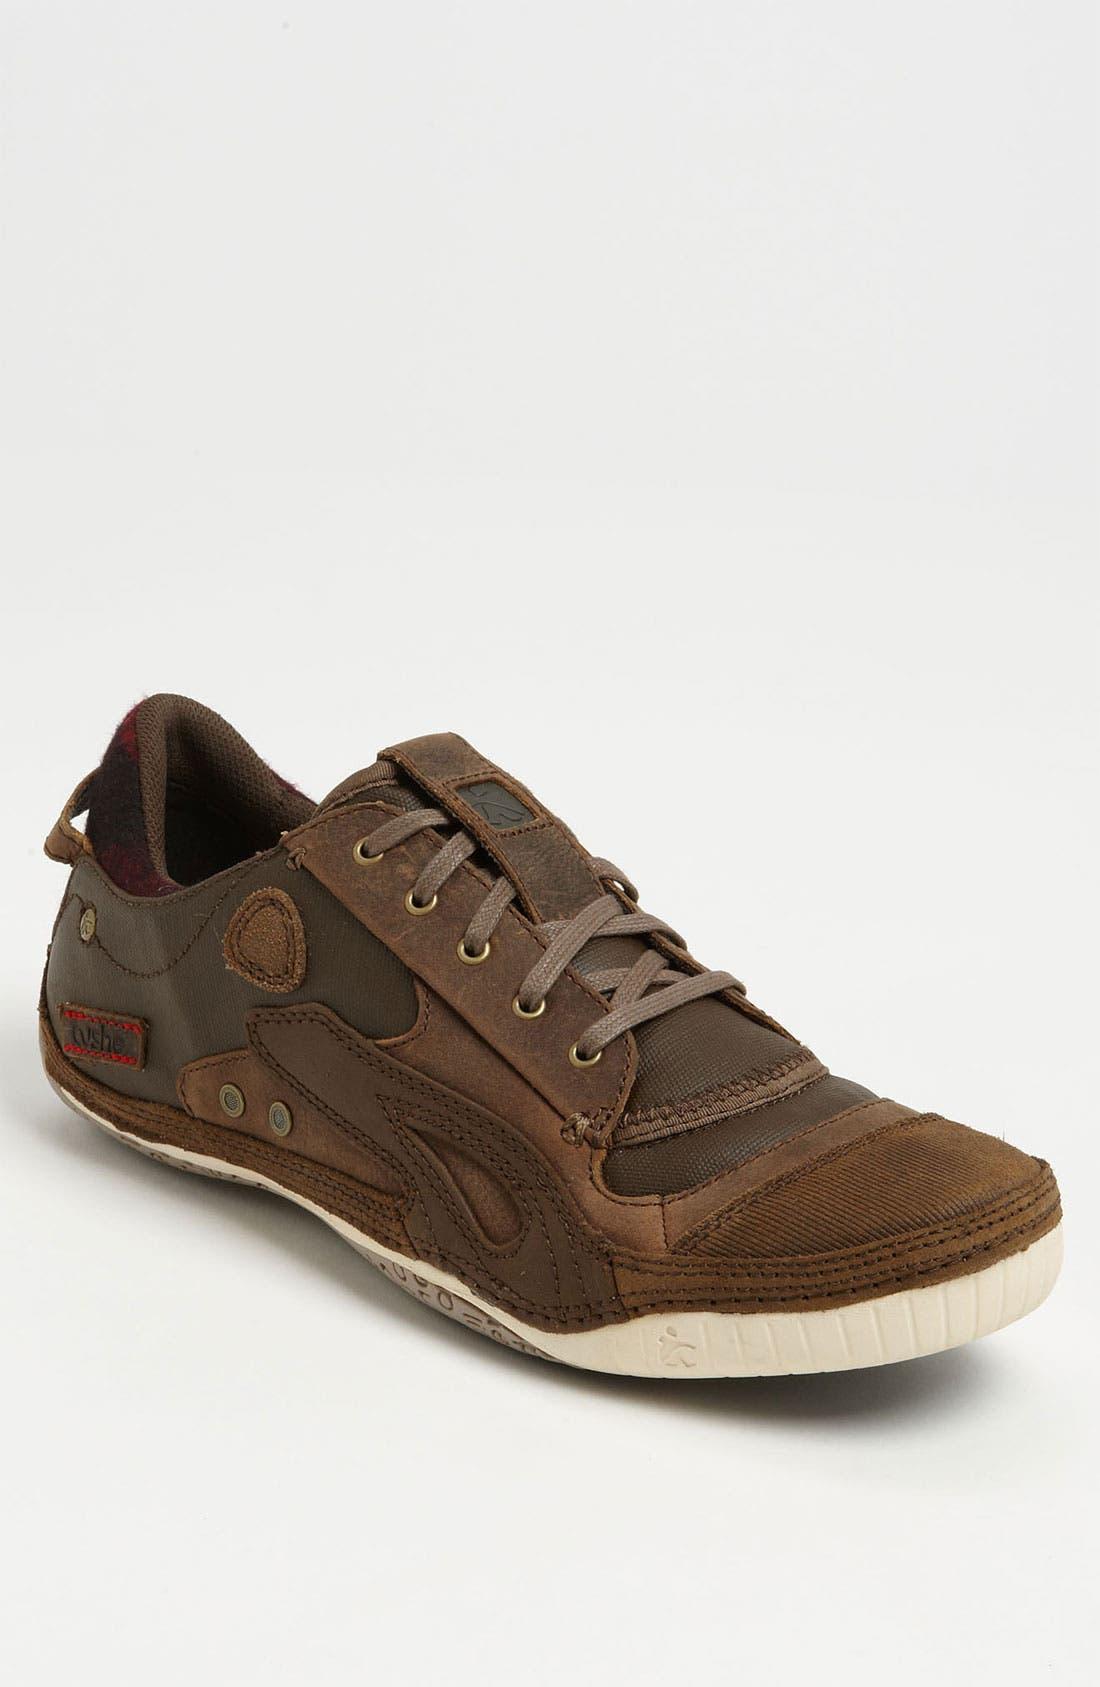 Main Image - Cushe 'Boutique Sneak' Sneaker (Men)